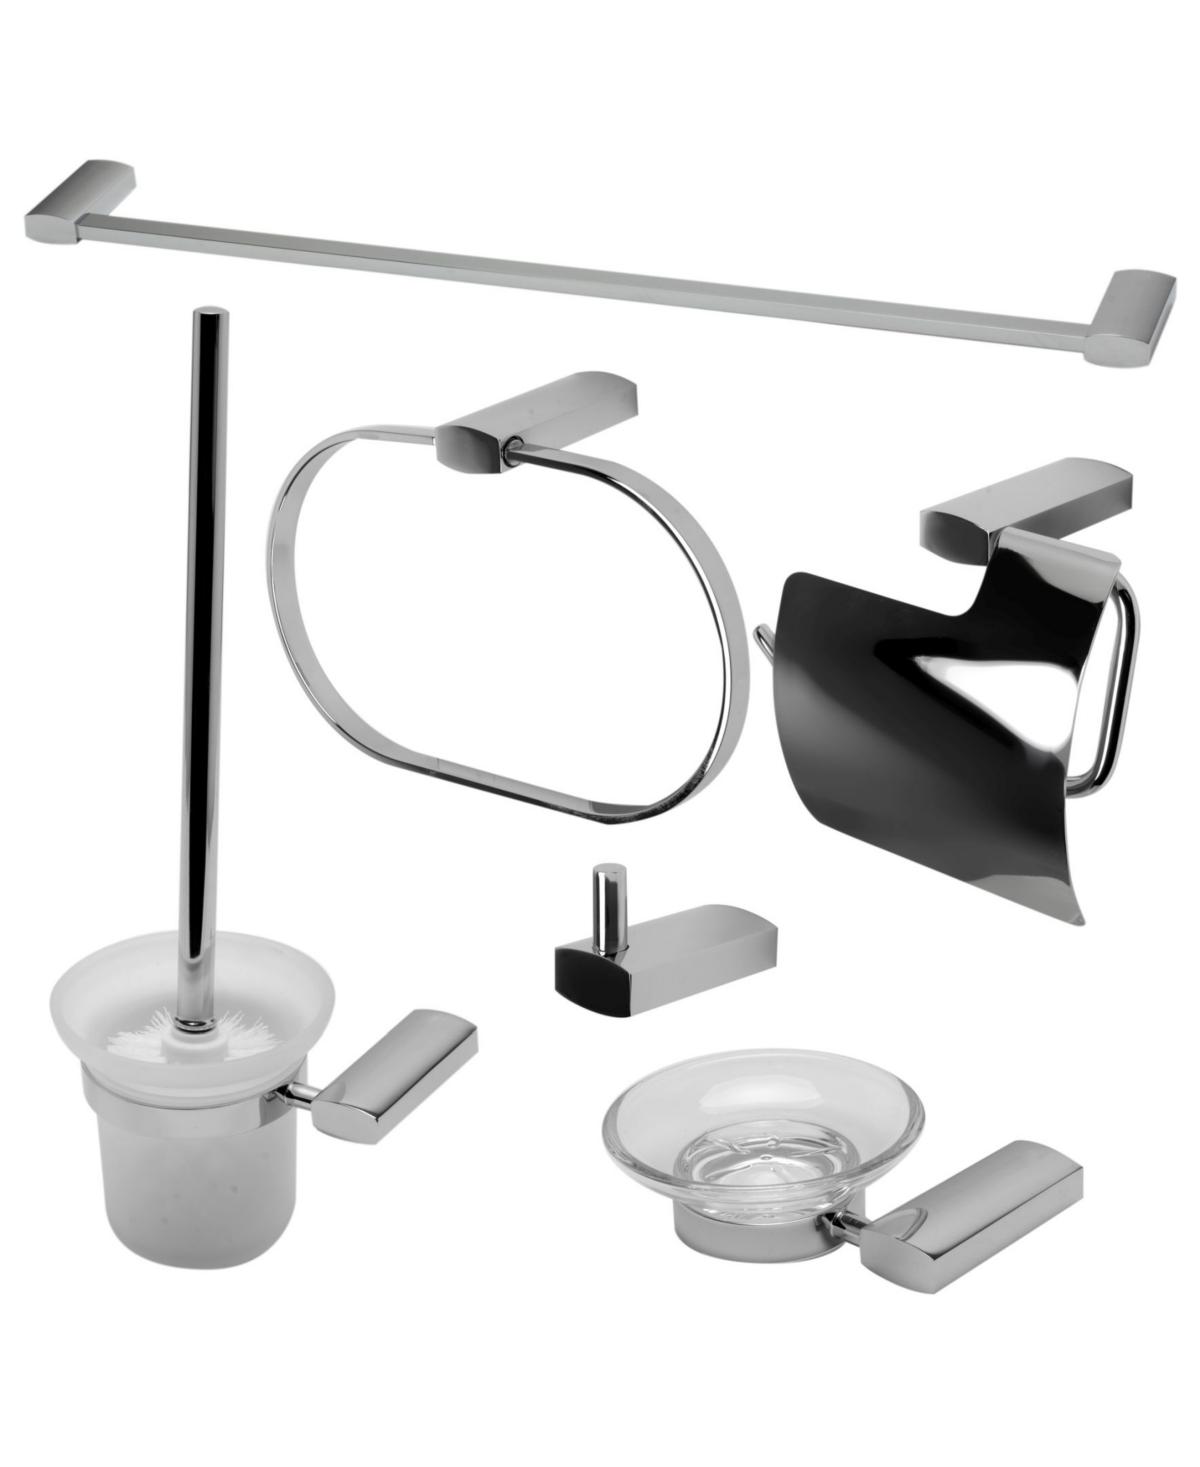 Alfi brand Polished Chrome Matching Bathroom Accessory Set, 6 Piece Bedding